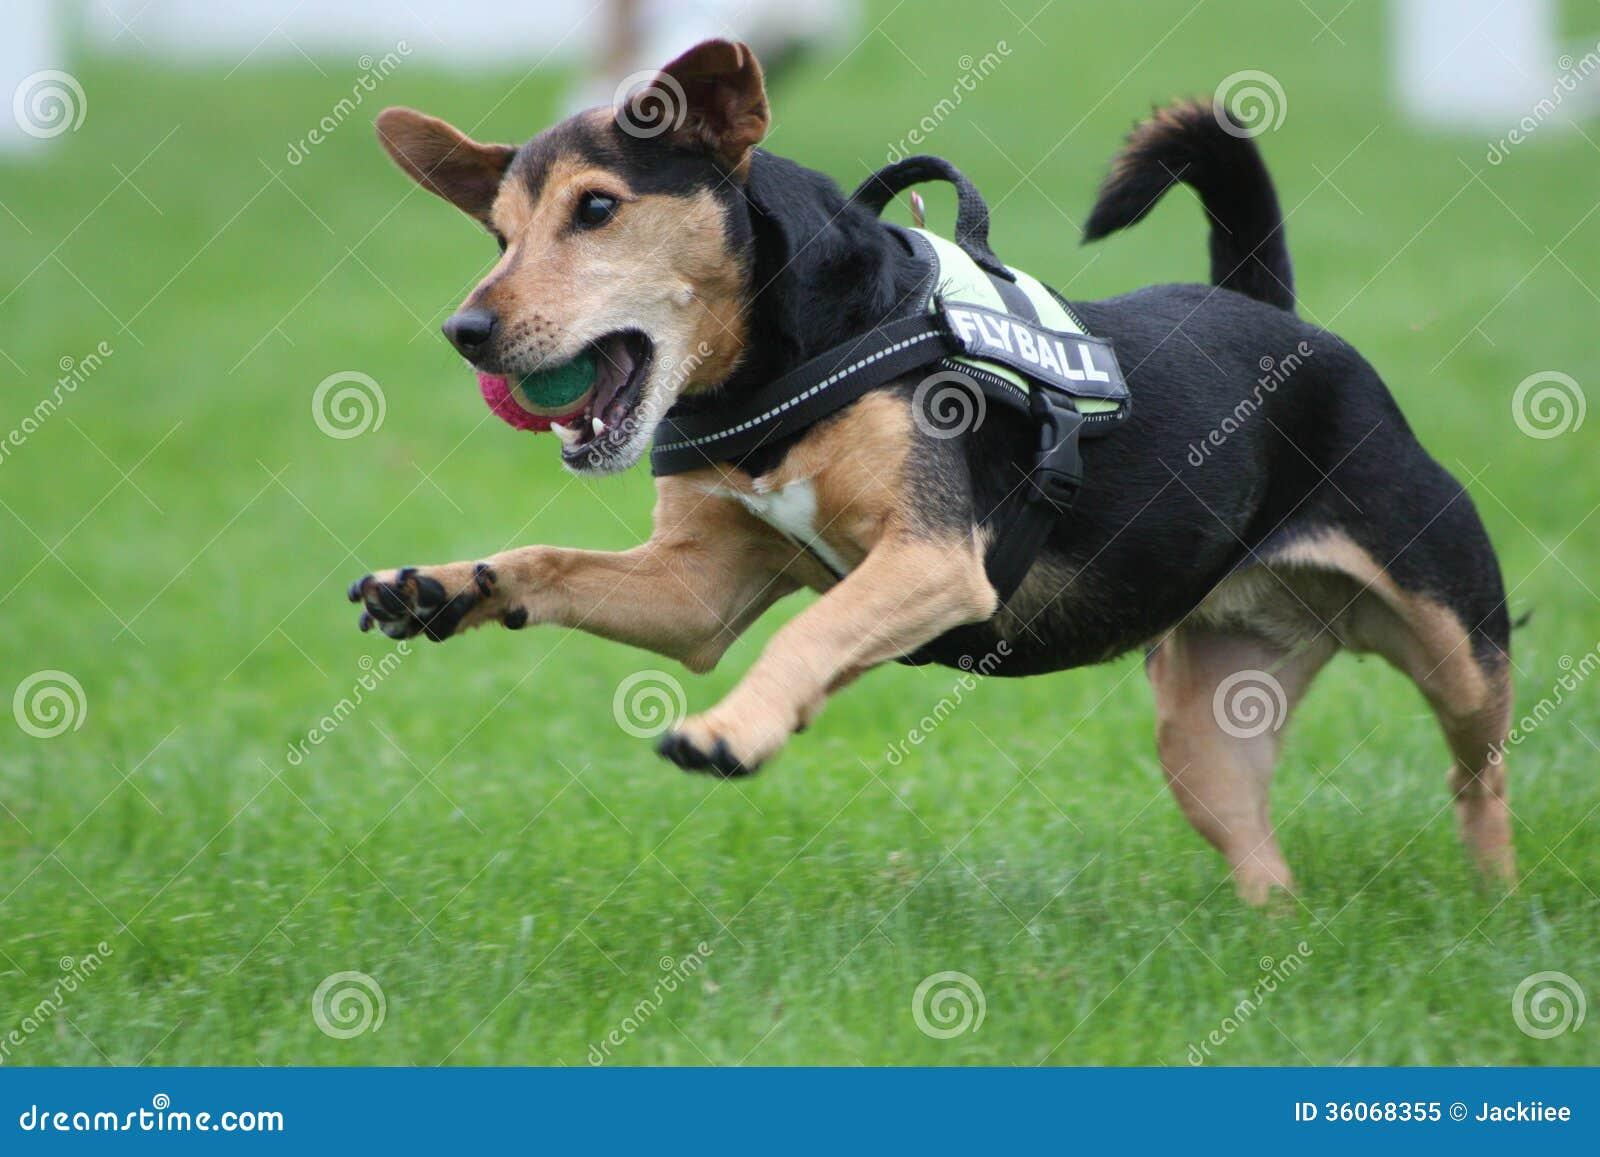 Jumping Dog Royalty Free Stock Photo - Image: 36068355